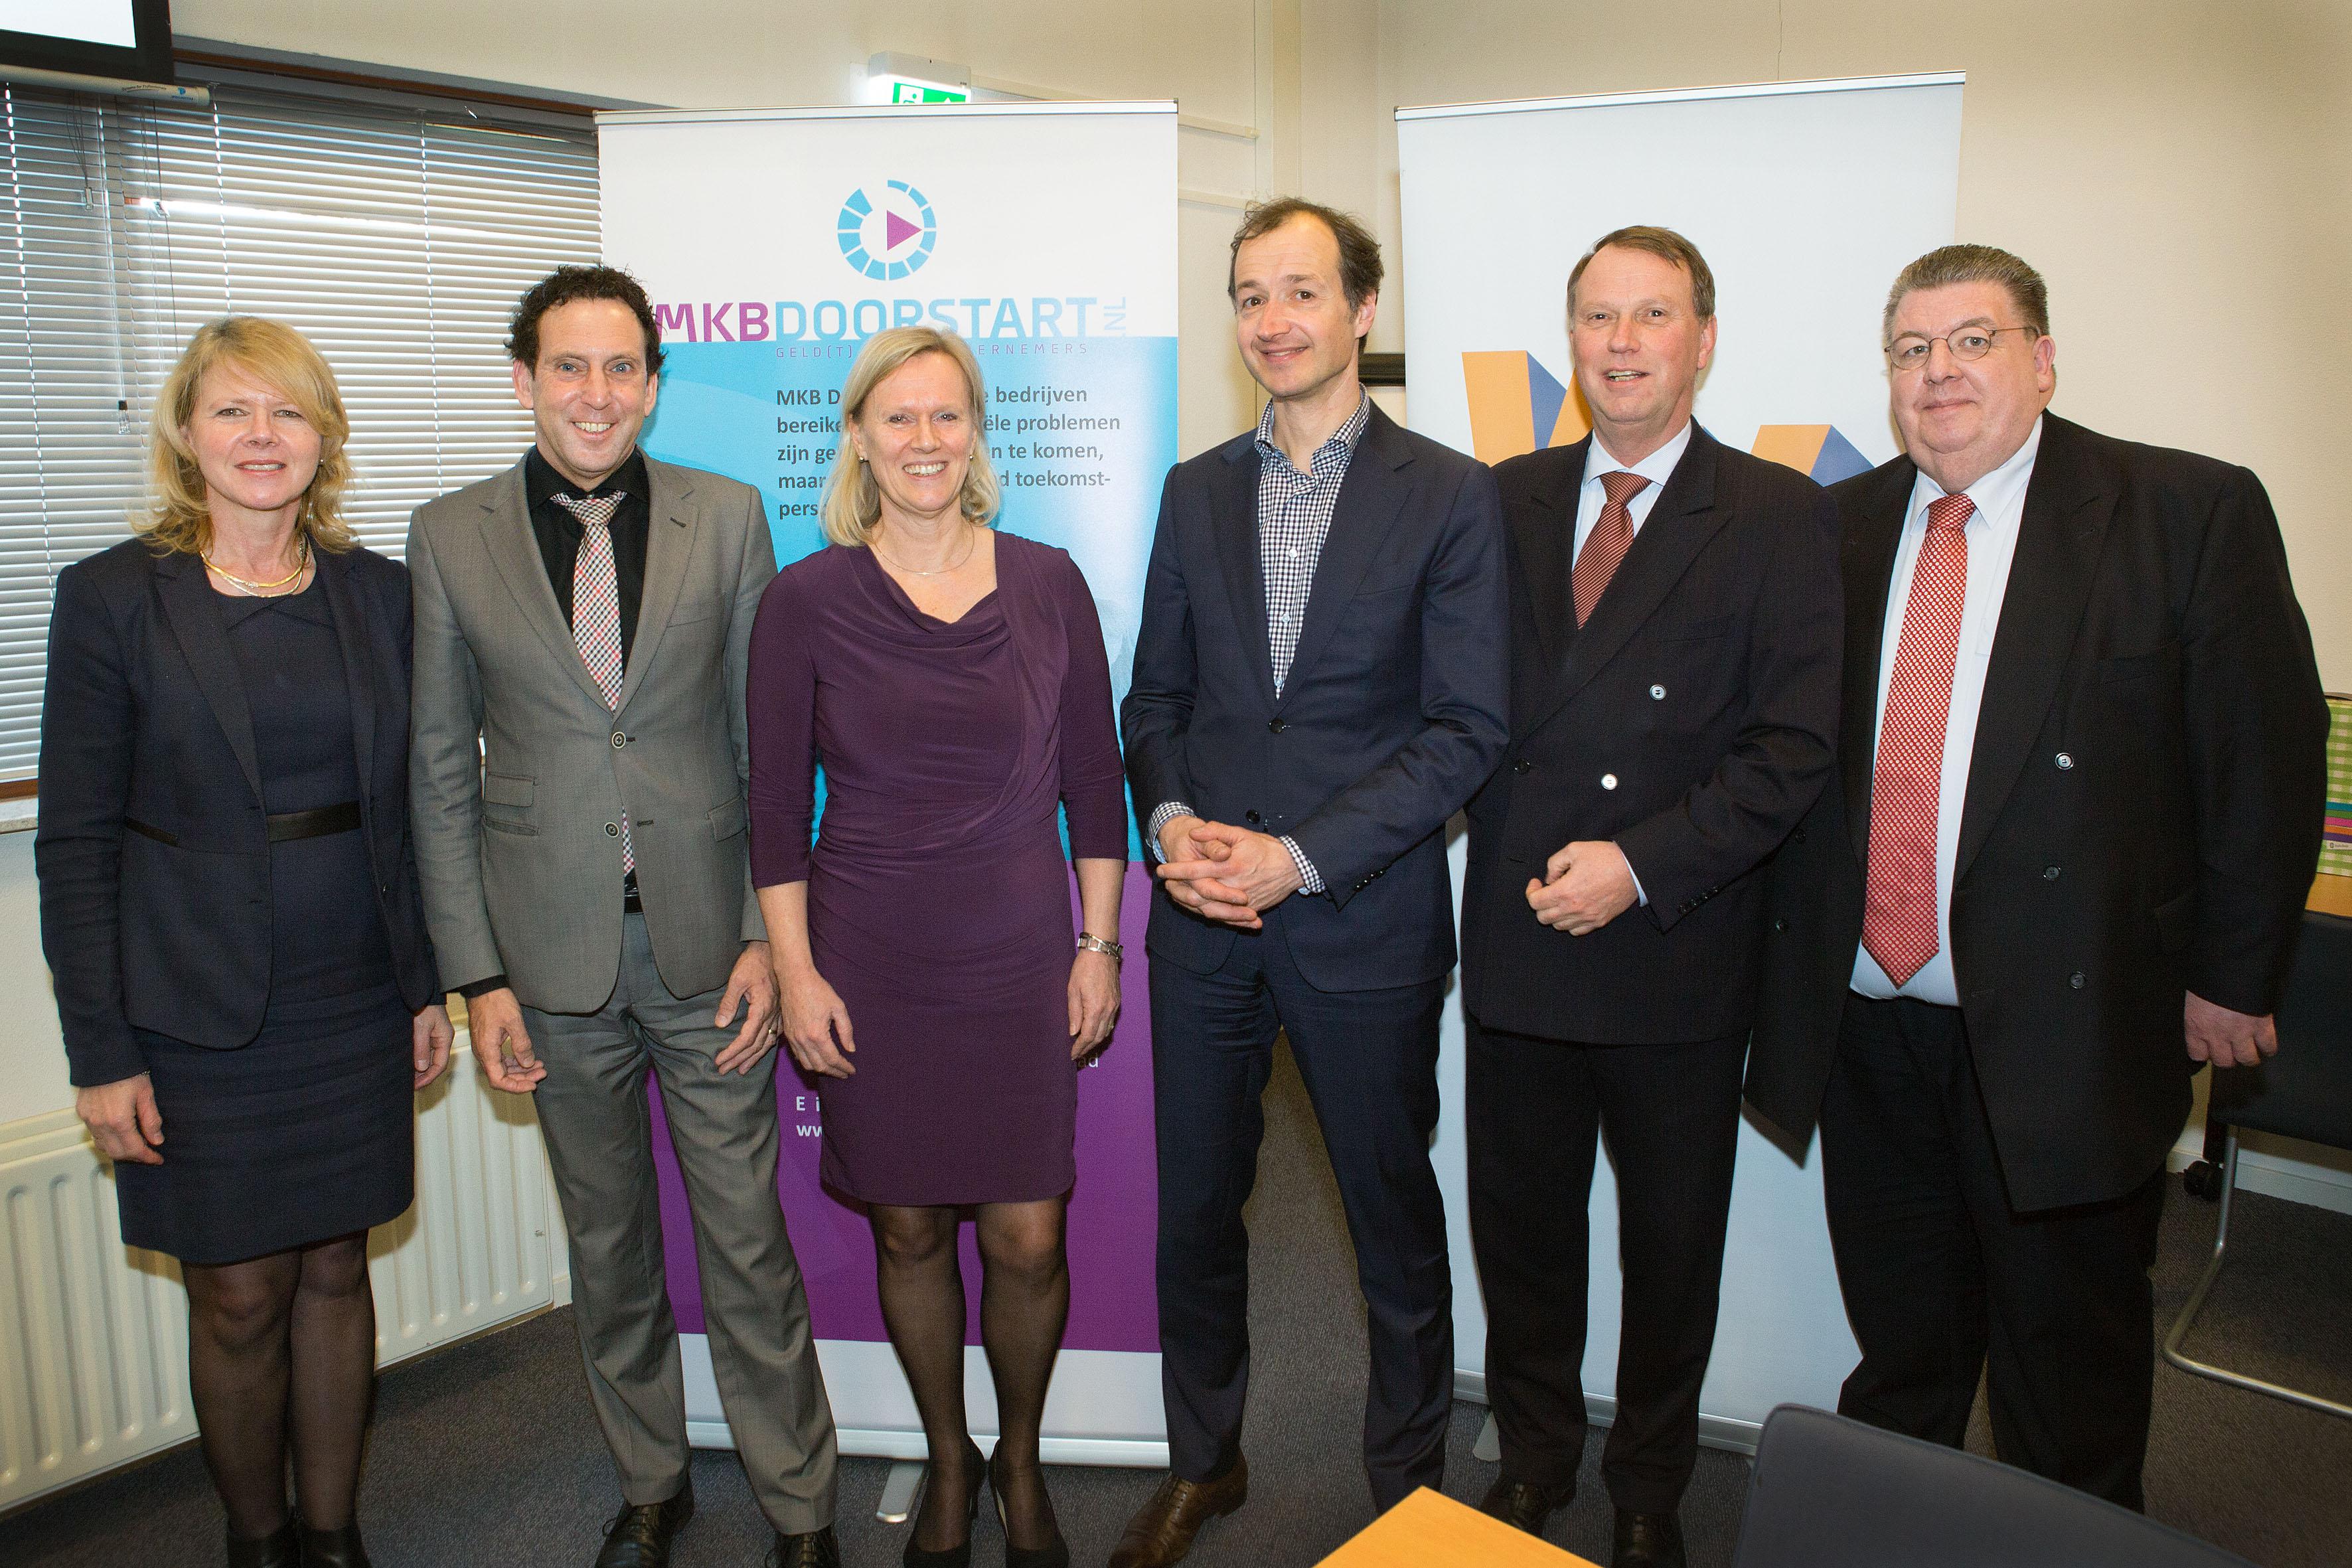 Vlnr: Janneke Sparreboom (wethouder in Lelystad), Jaap Lodders (gedeputeerde), Jannie van den Berg (MKBDoorgaan.nl), Eric Wiebes (staatssecretaris Financiën), Jan de Reus (statenlid), Huib van Vliet (statenlid).